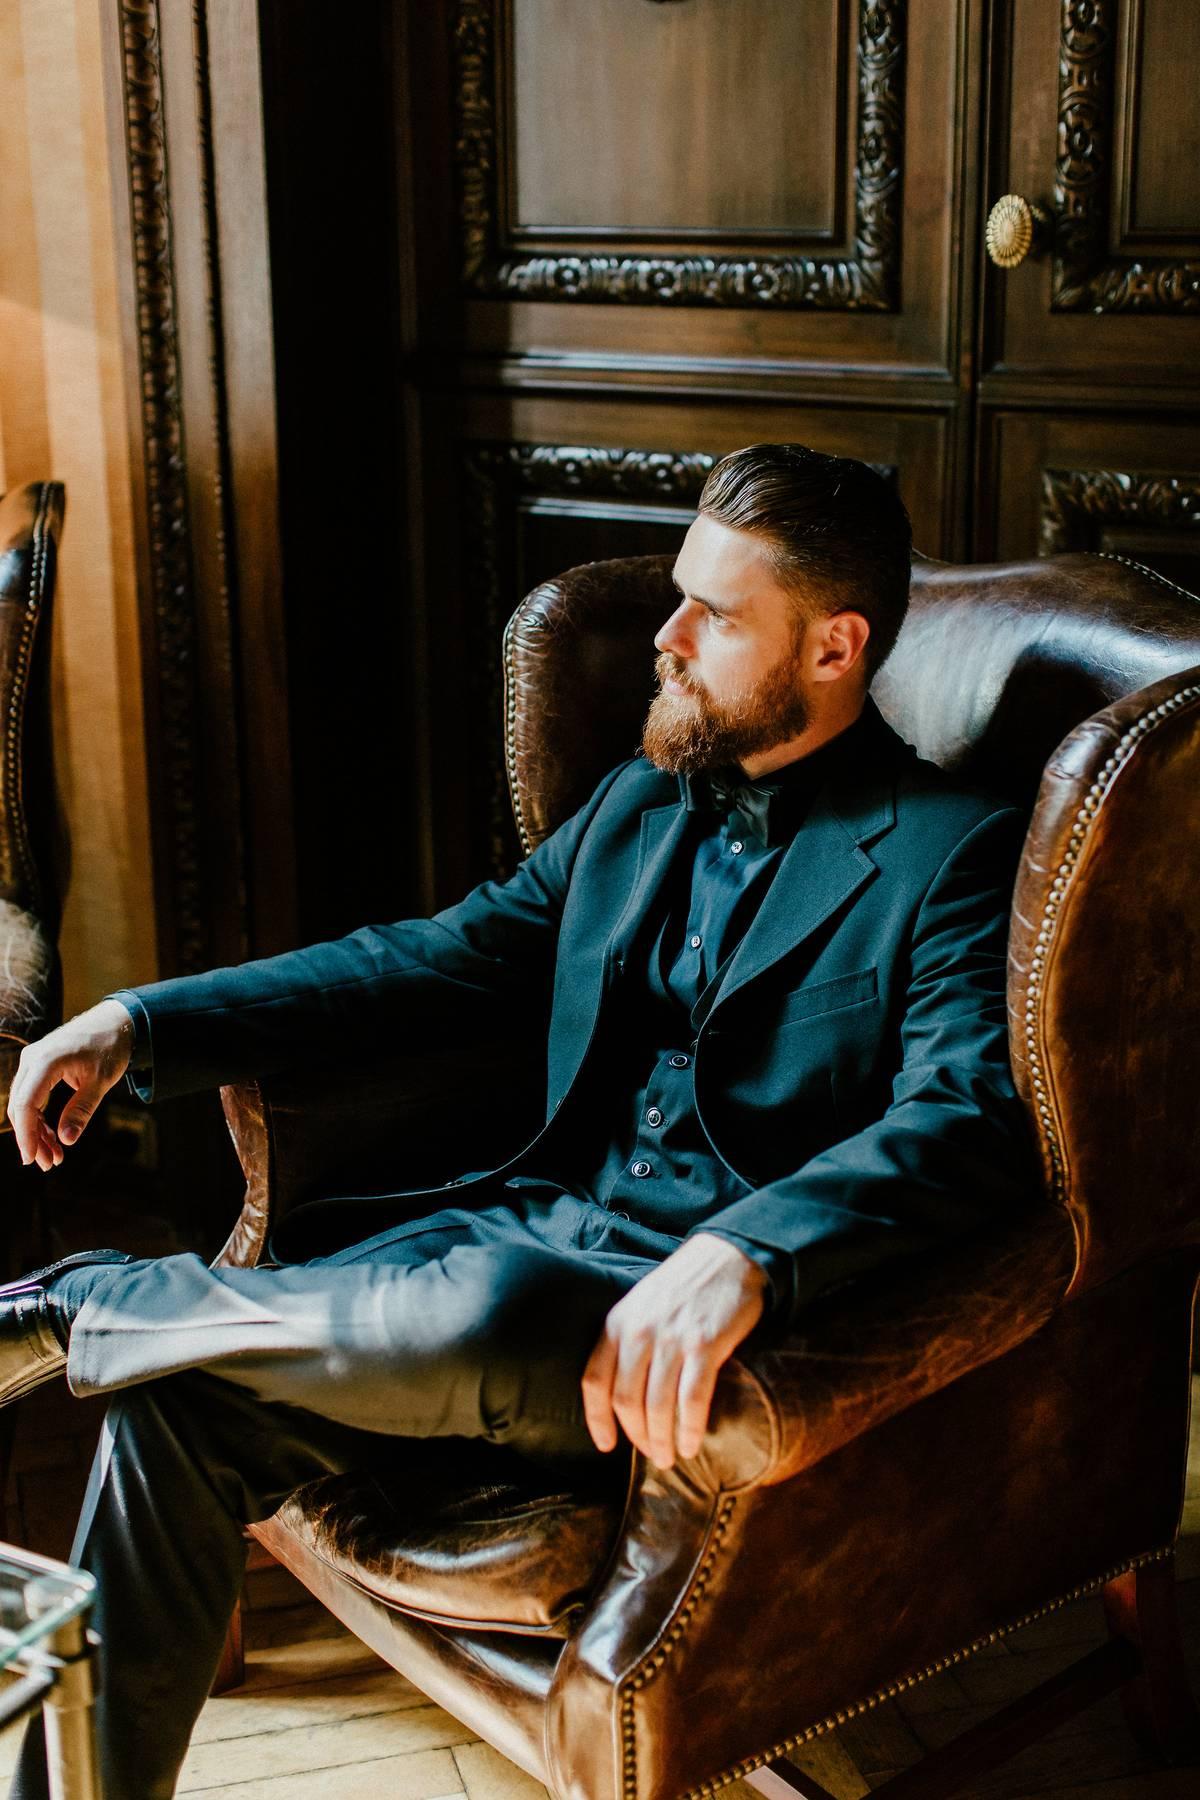 Sänger aus Berlin | Alexander Grant